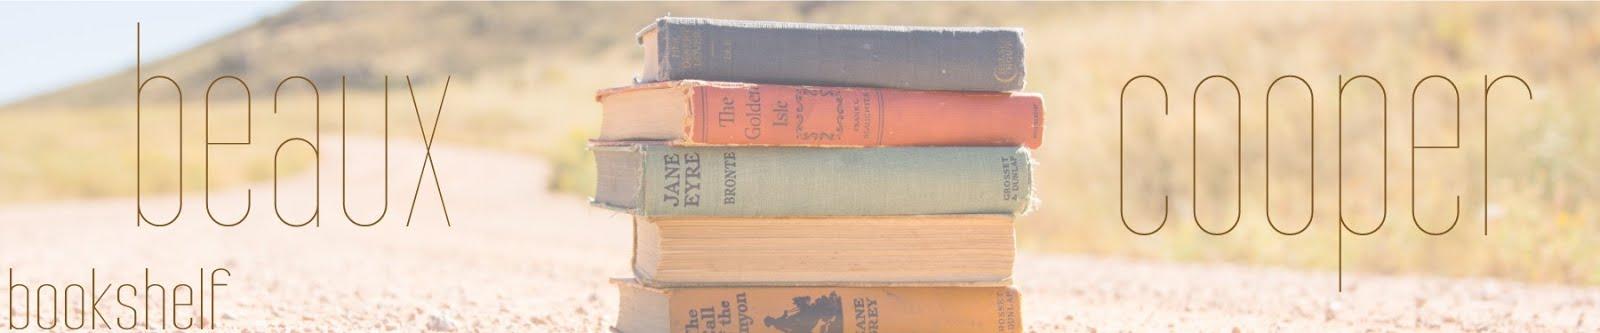 Bookshelf by Beaux Cooper